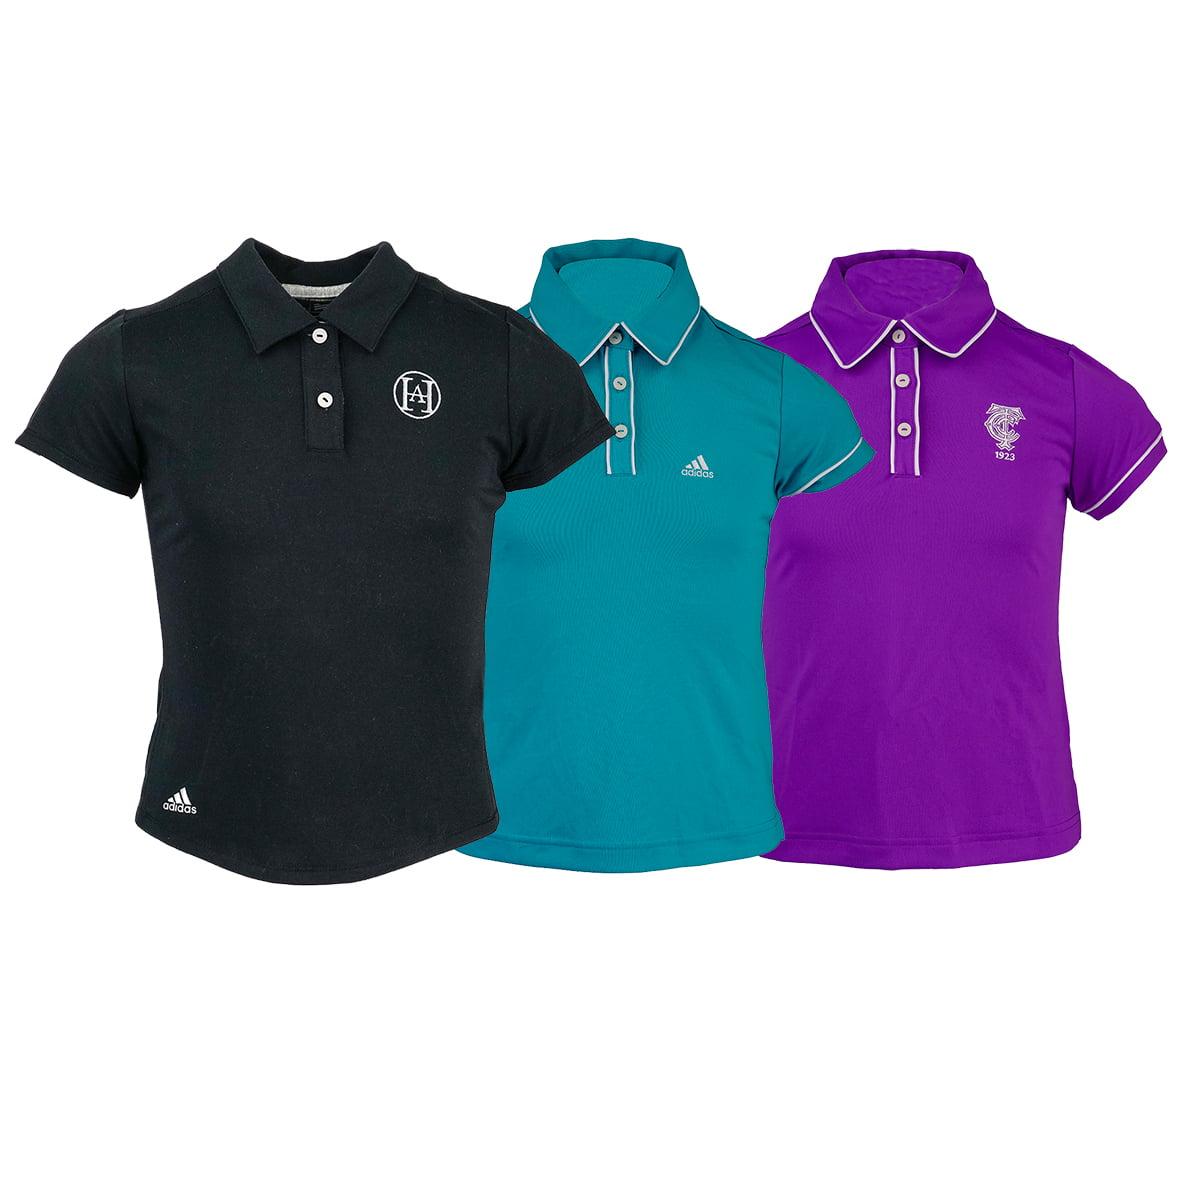 m and m adidas polo shirt